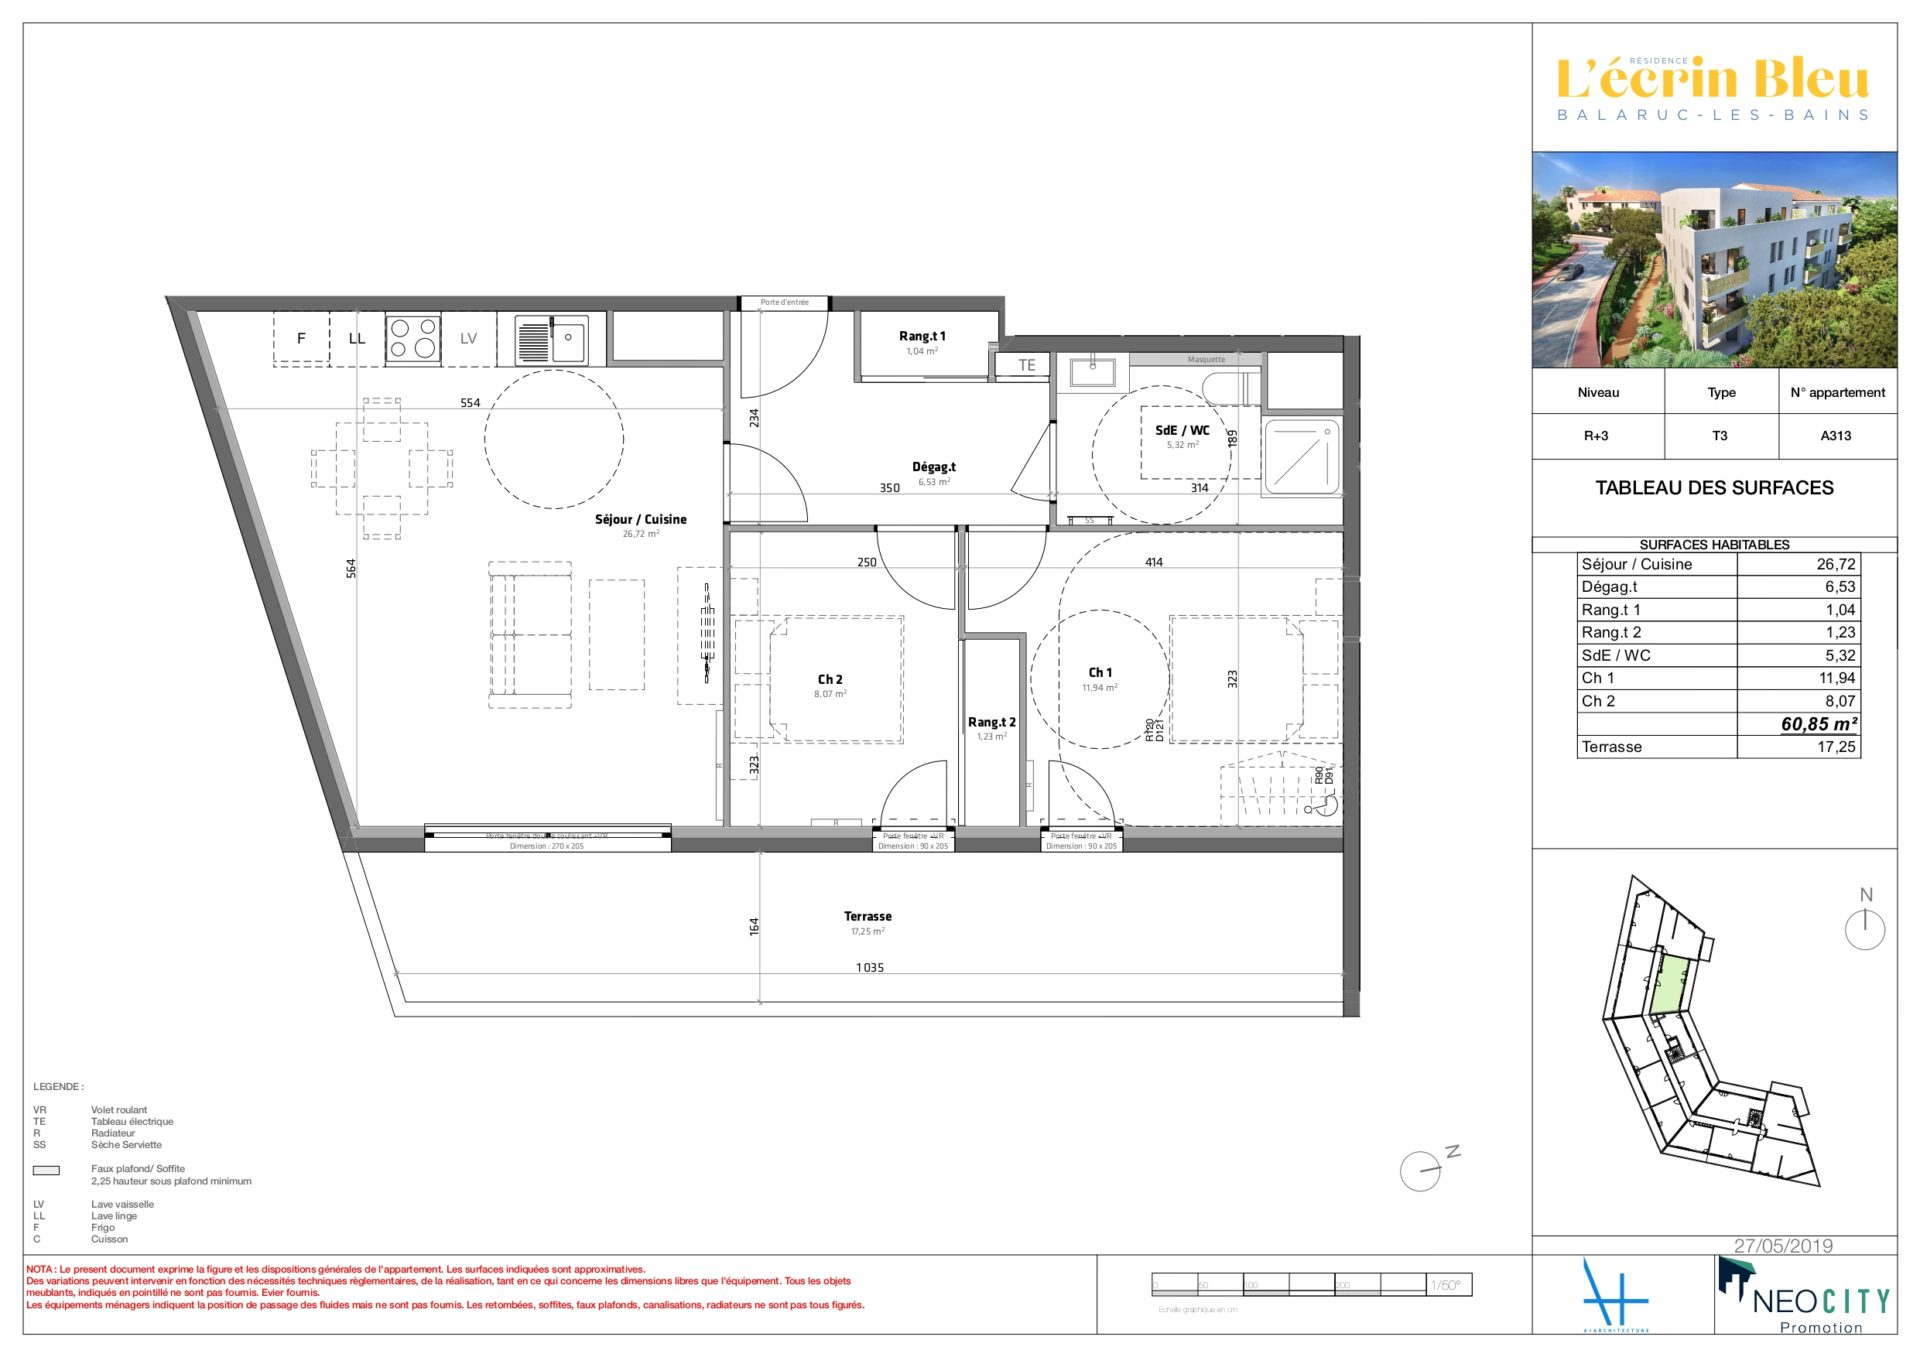 Plan de vente - immobilier neuf